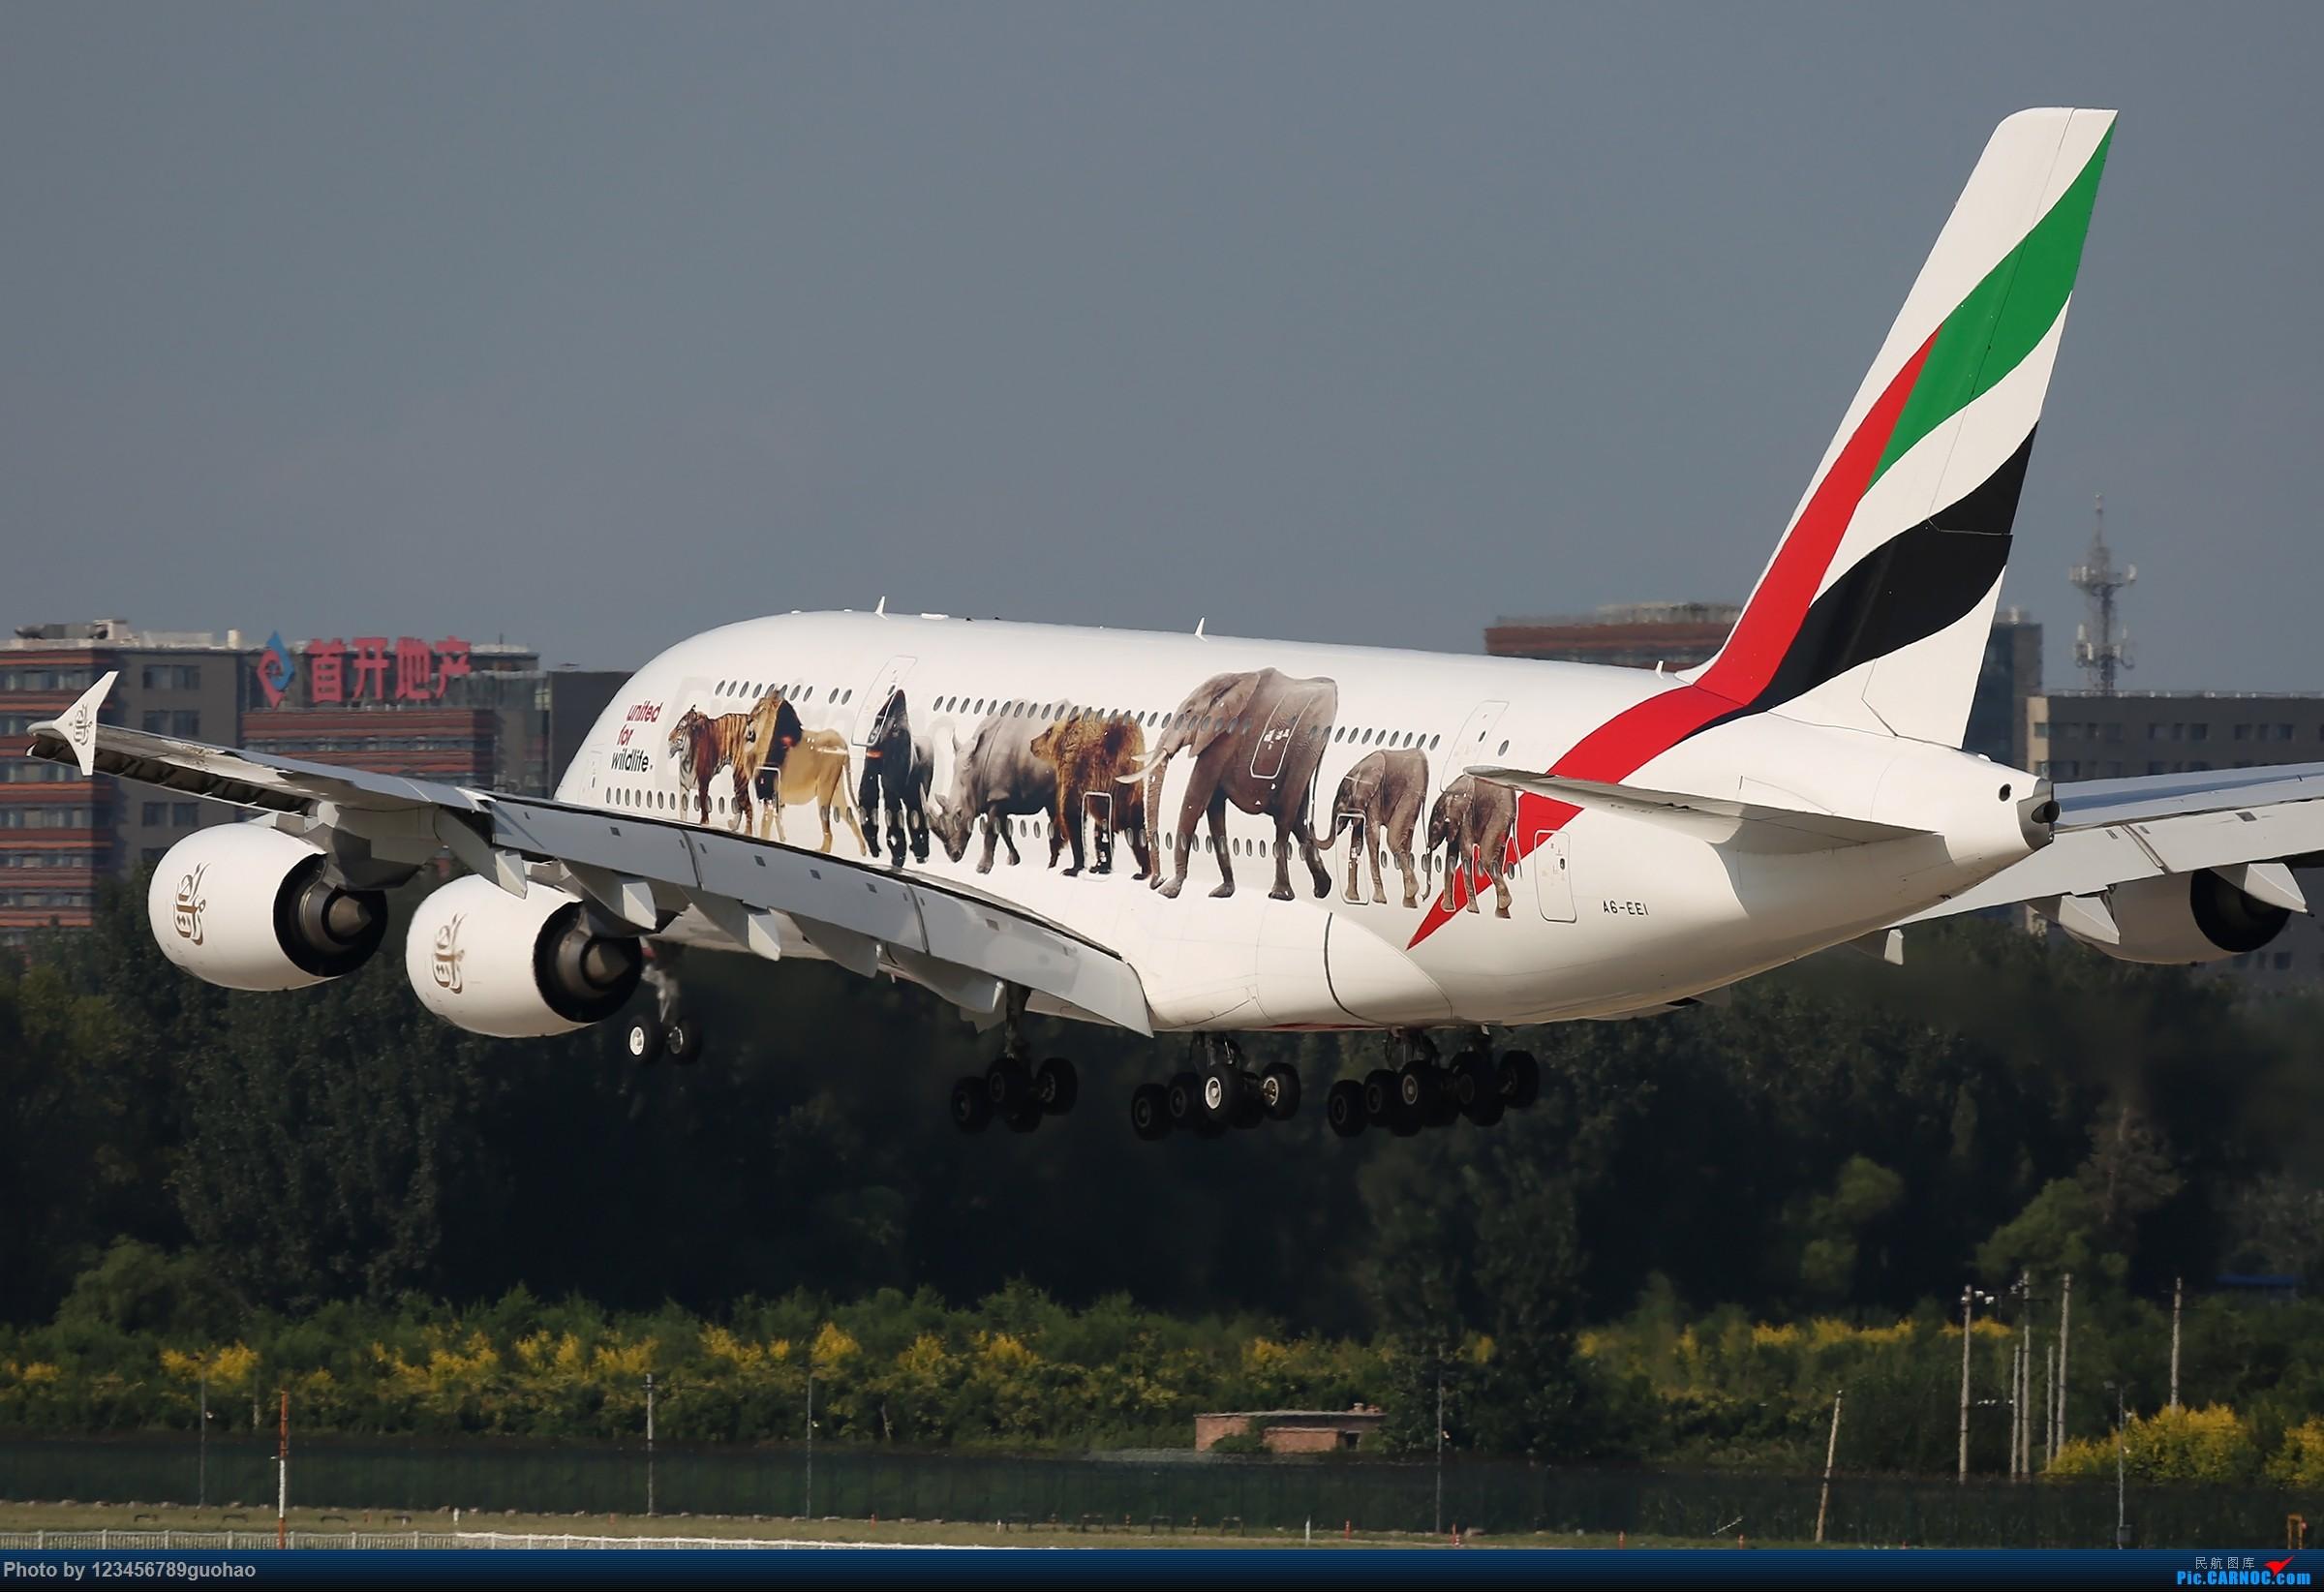 Re:[原创]请保护我们身边的野生动物 AIRBUS A380-800 A6-EEI 北京首都机场